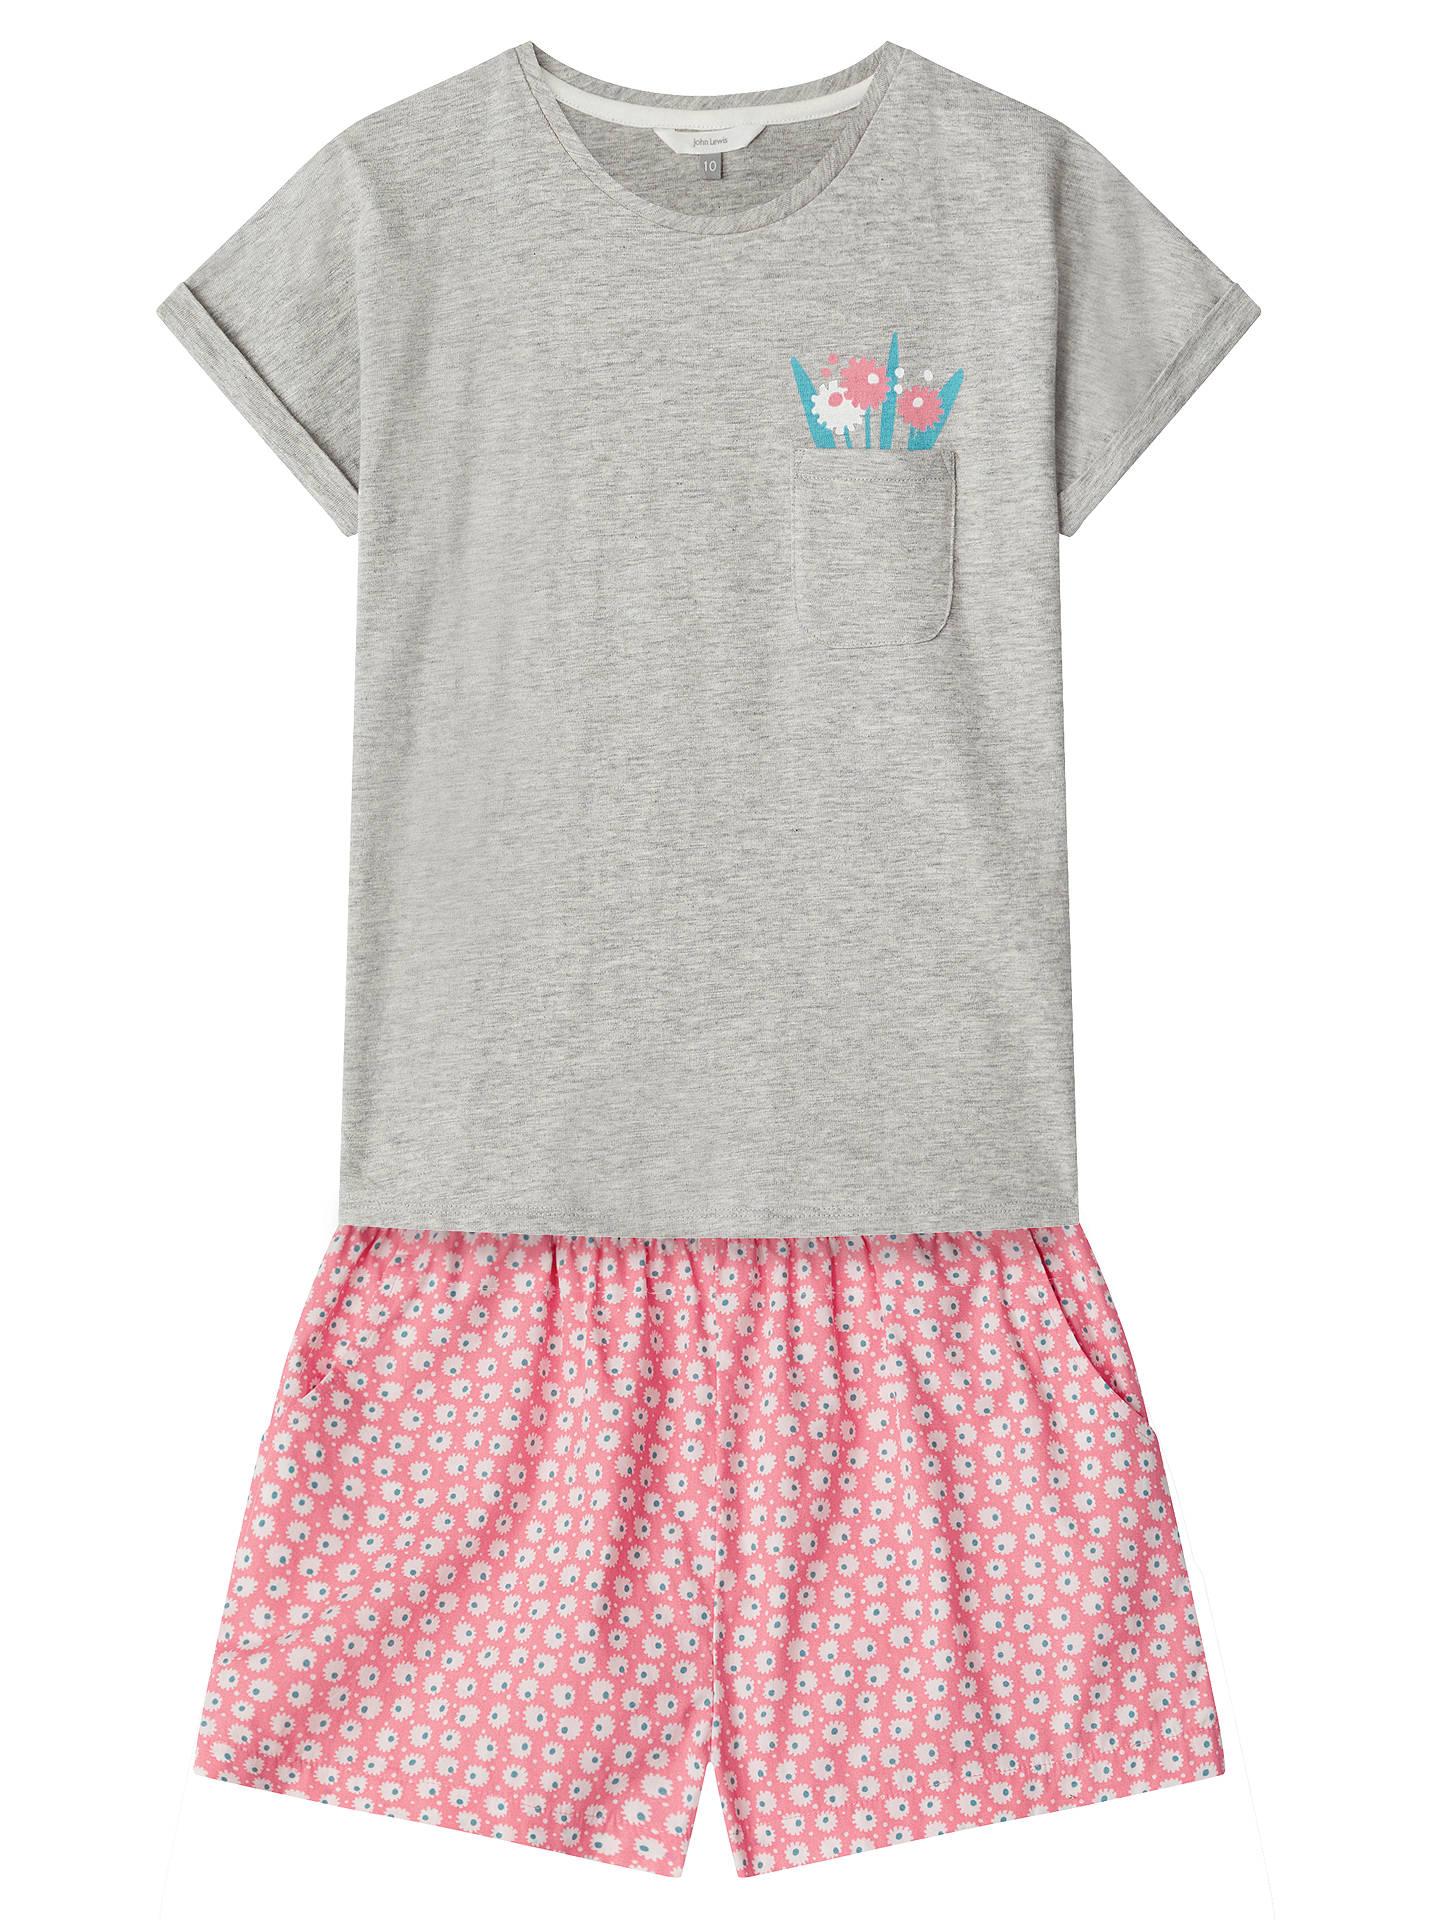 BuyJohn Lewis Girls  Snooze Club Short Pyjamas e79f402bf